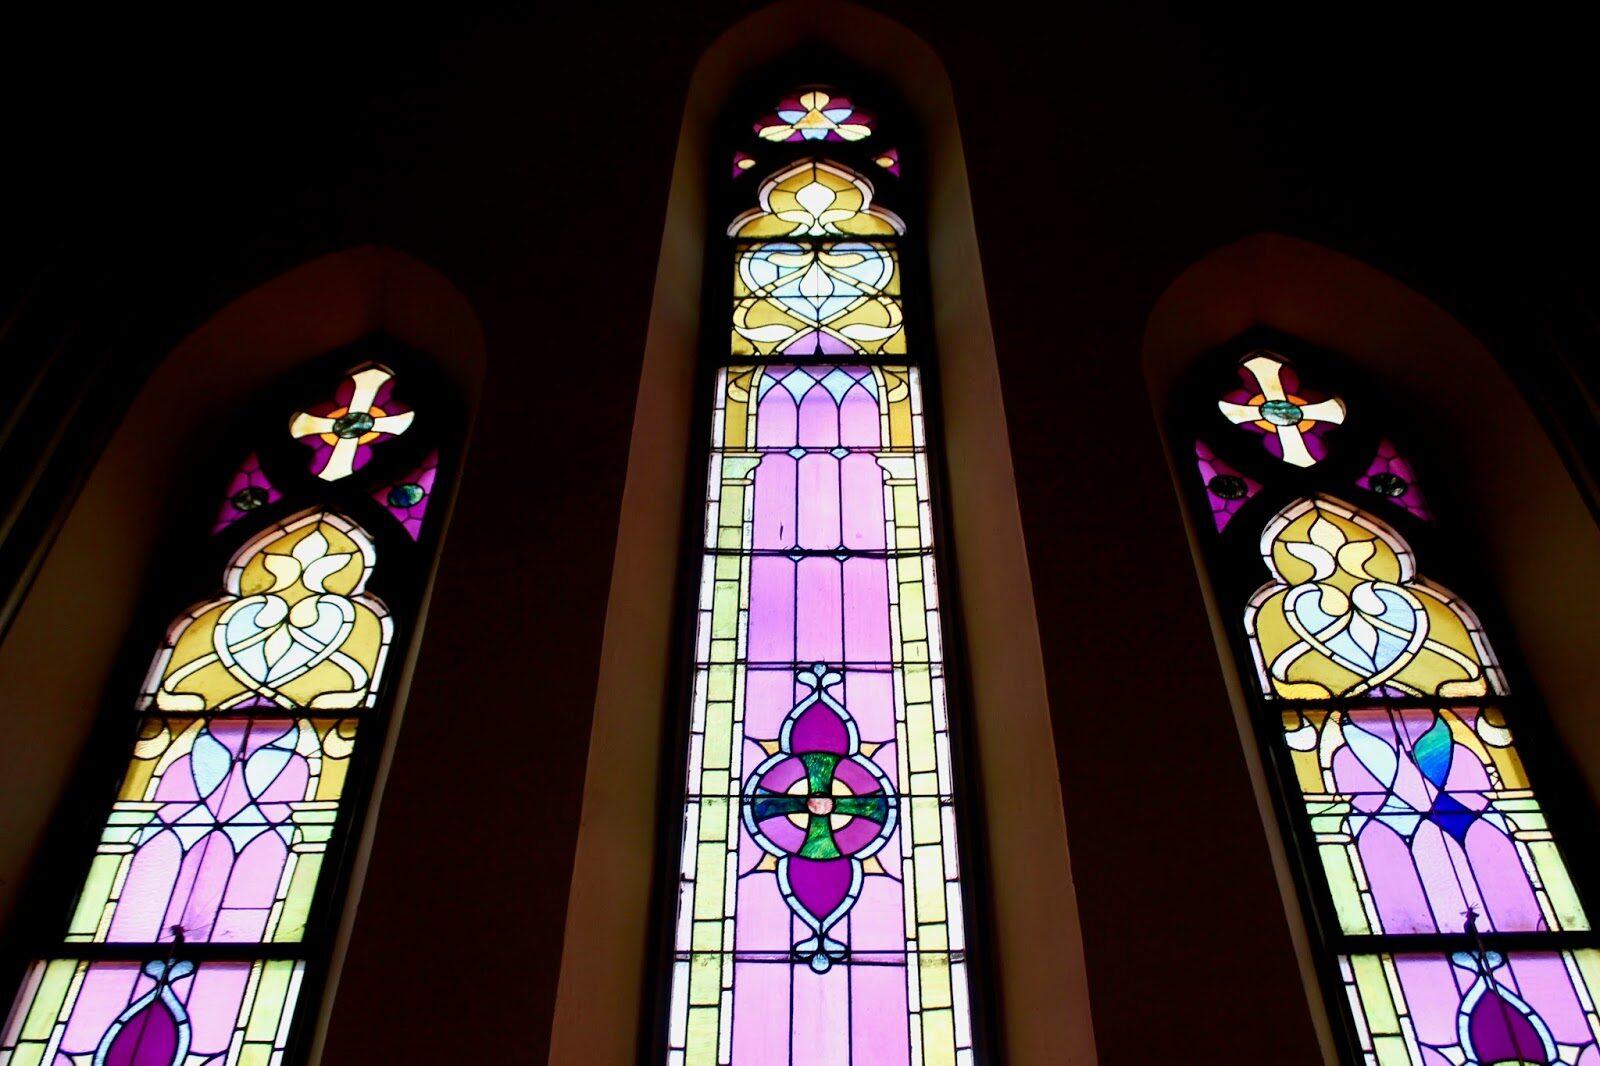 A historic and friendly parish in South Buffalo | Weekend Masses: 4:30 Sat, 8:45 & 11 AM Sun | 1974 Seneca St. Buffalo, NY 14210 | (716) 822-0608